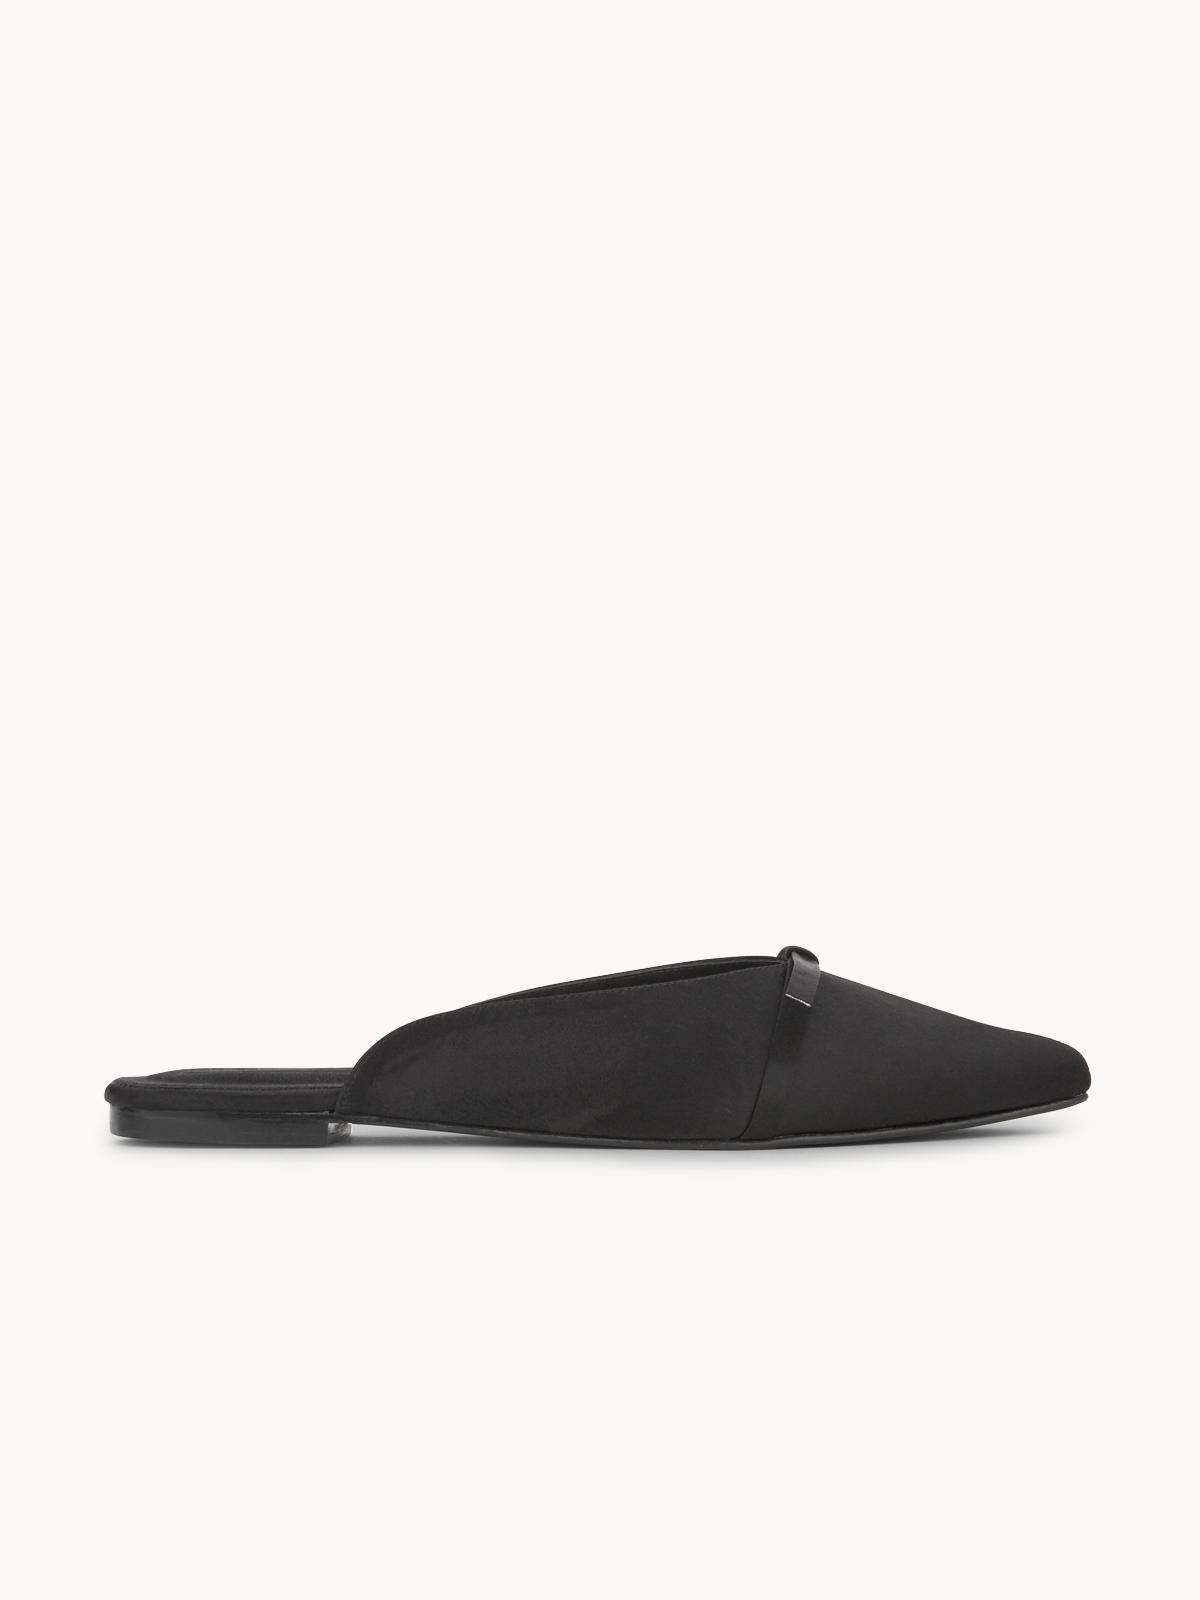 Thara Bouquet Slide Mules Black